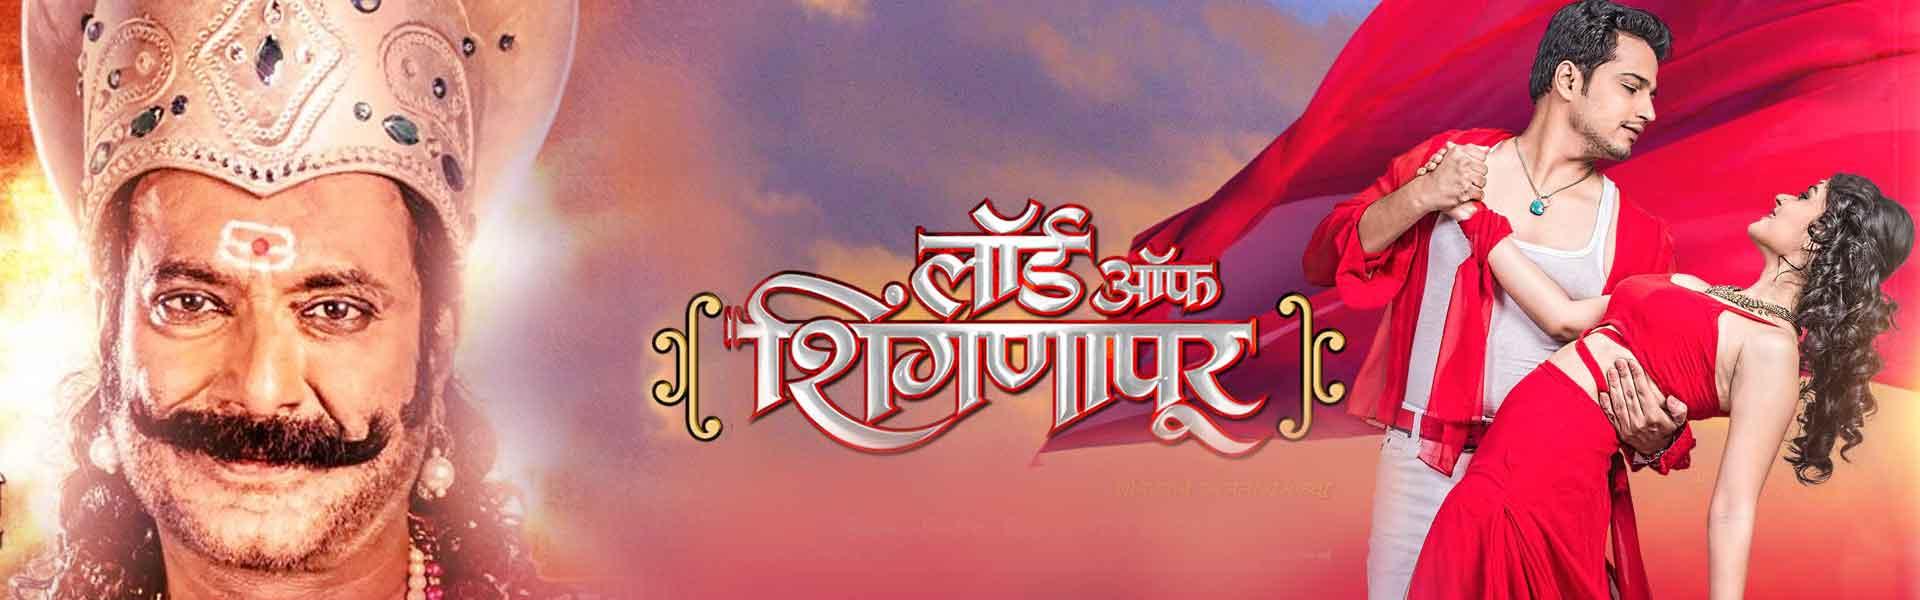 Lord of Shingnapur